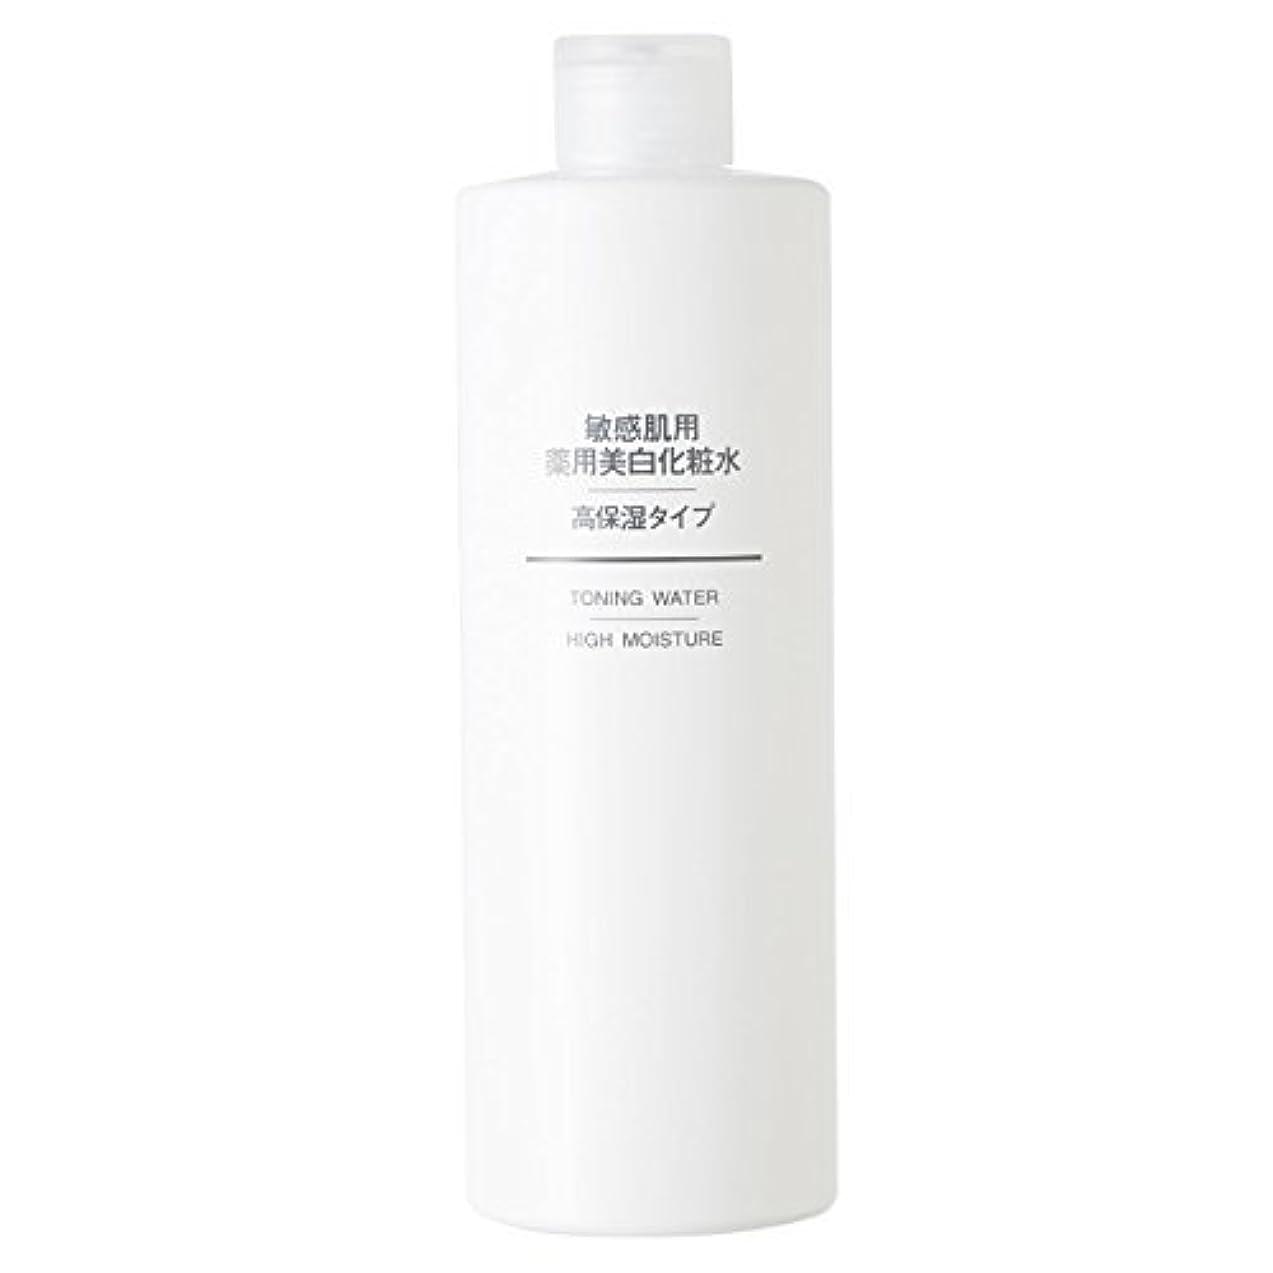 レザー貝殻陰謀無印良品 敏感肌用薬用美白化粧水?高保湿タイプ(大容量) (新)400ml